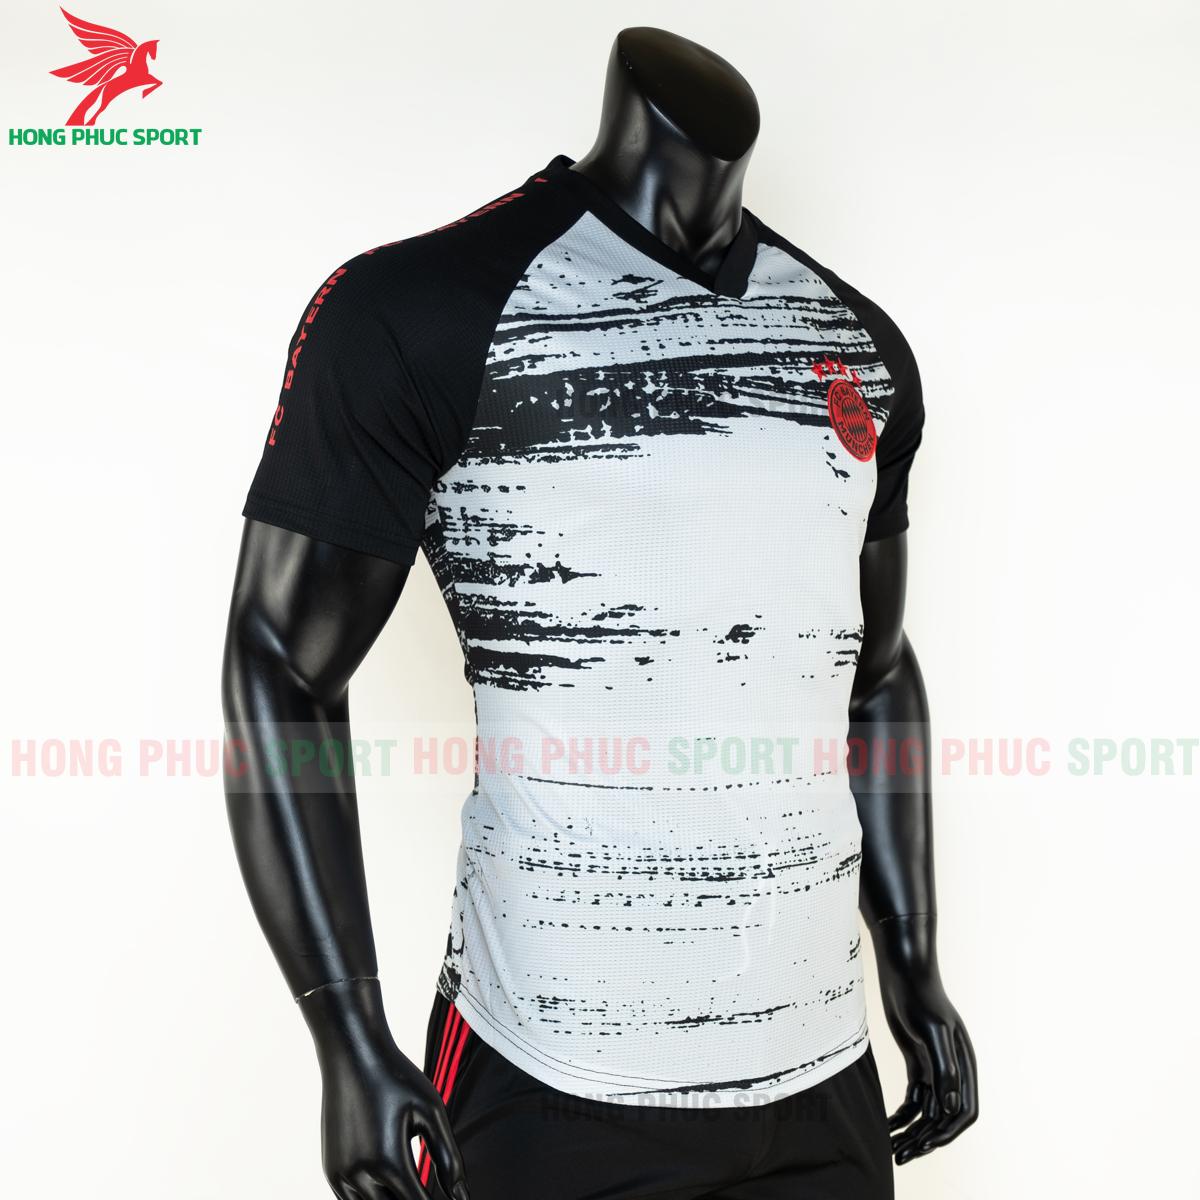 https://cdn.hongphucsport.com/unsafe/s4.shopbay.vn/files/285/ao-bong-da-bayern-munich-2020-2021-pre-match-hang-thailand-3-5f8febf36c3fa.png